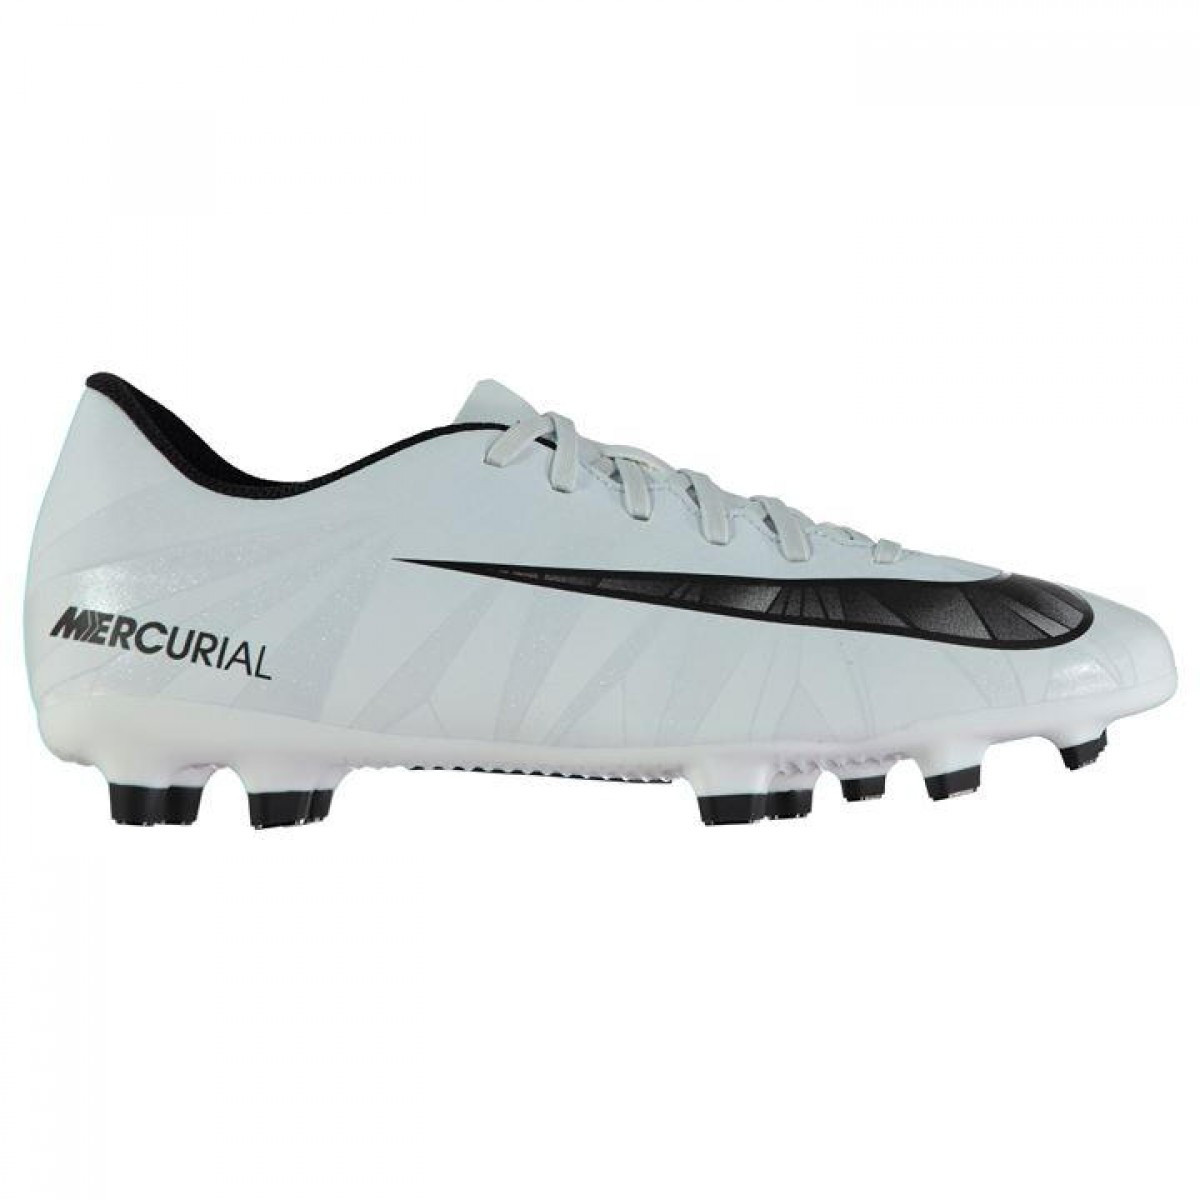 c8273131 Бутсы Nike Mercurial Vortex CR7 FG Football Blue/Black - Оригинал -  Интернет магазин